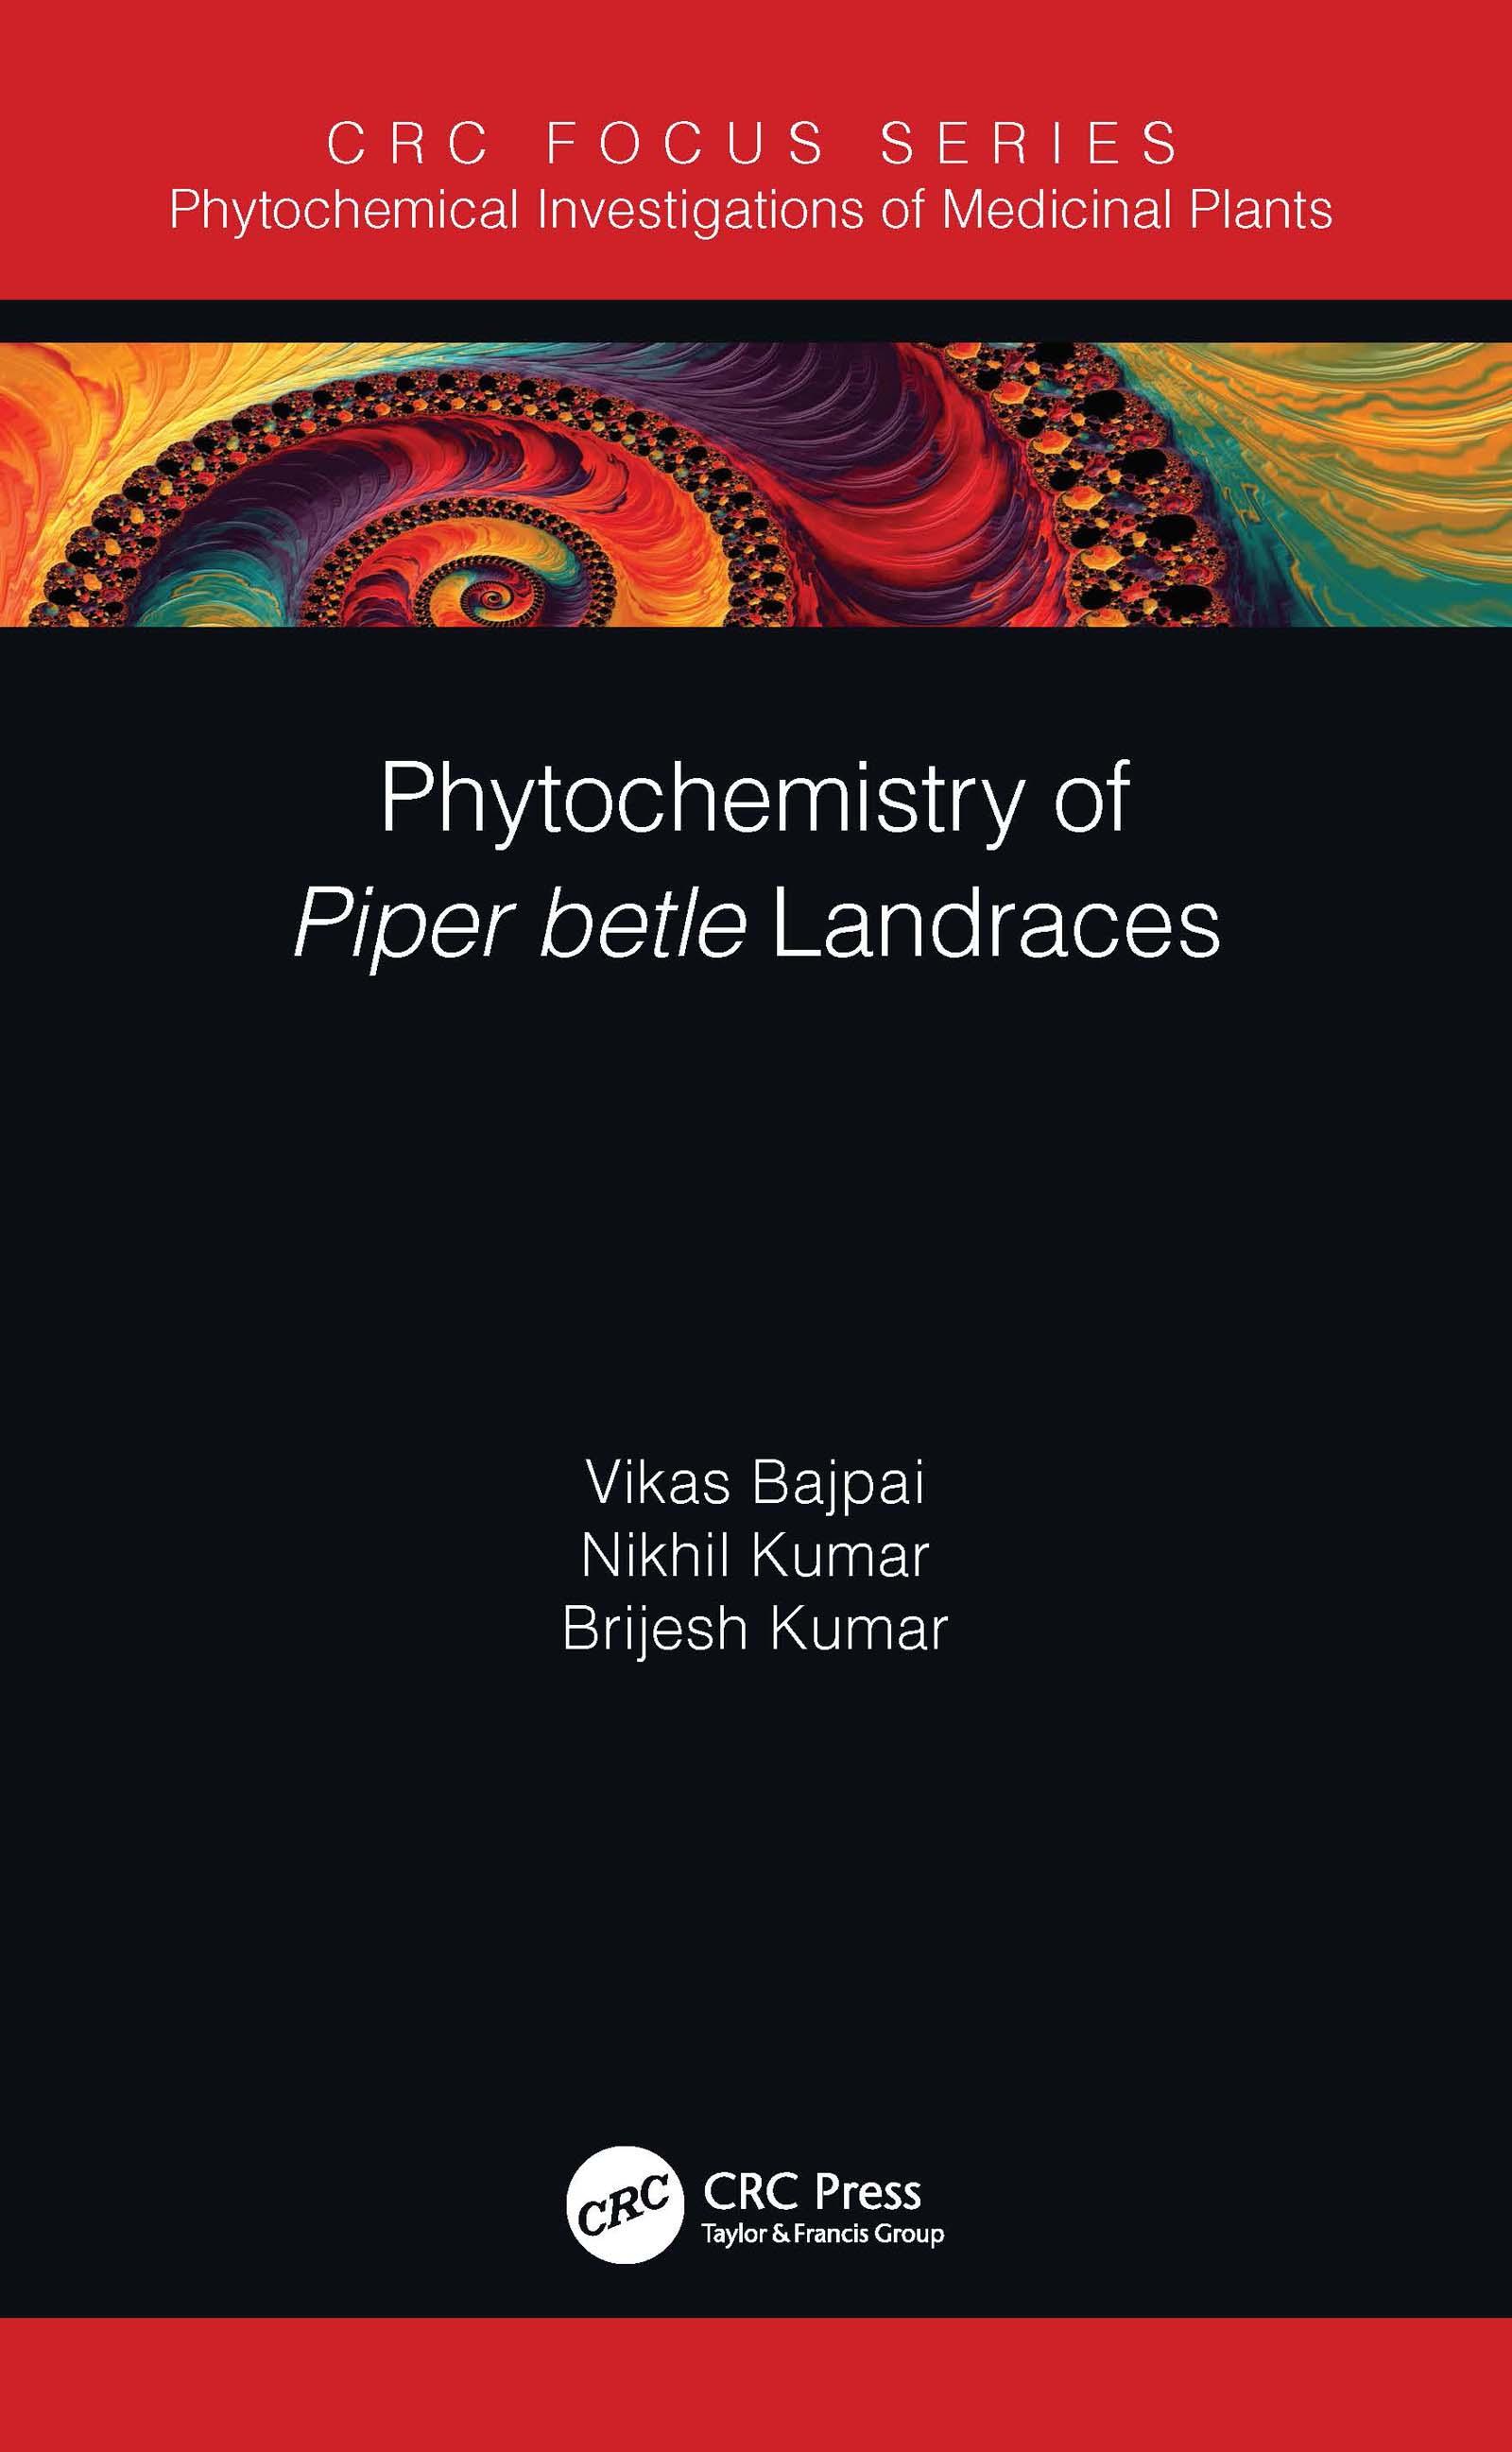 Phytochemistry of Piper betle Landraces